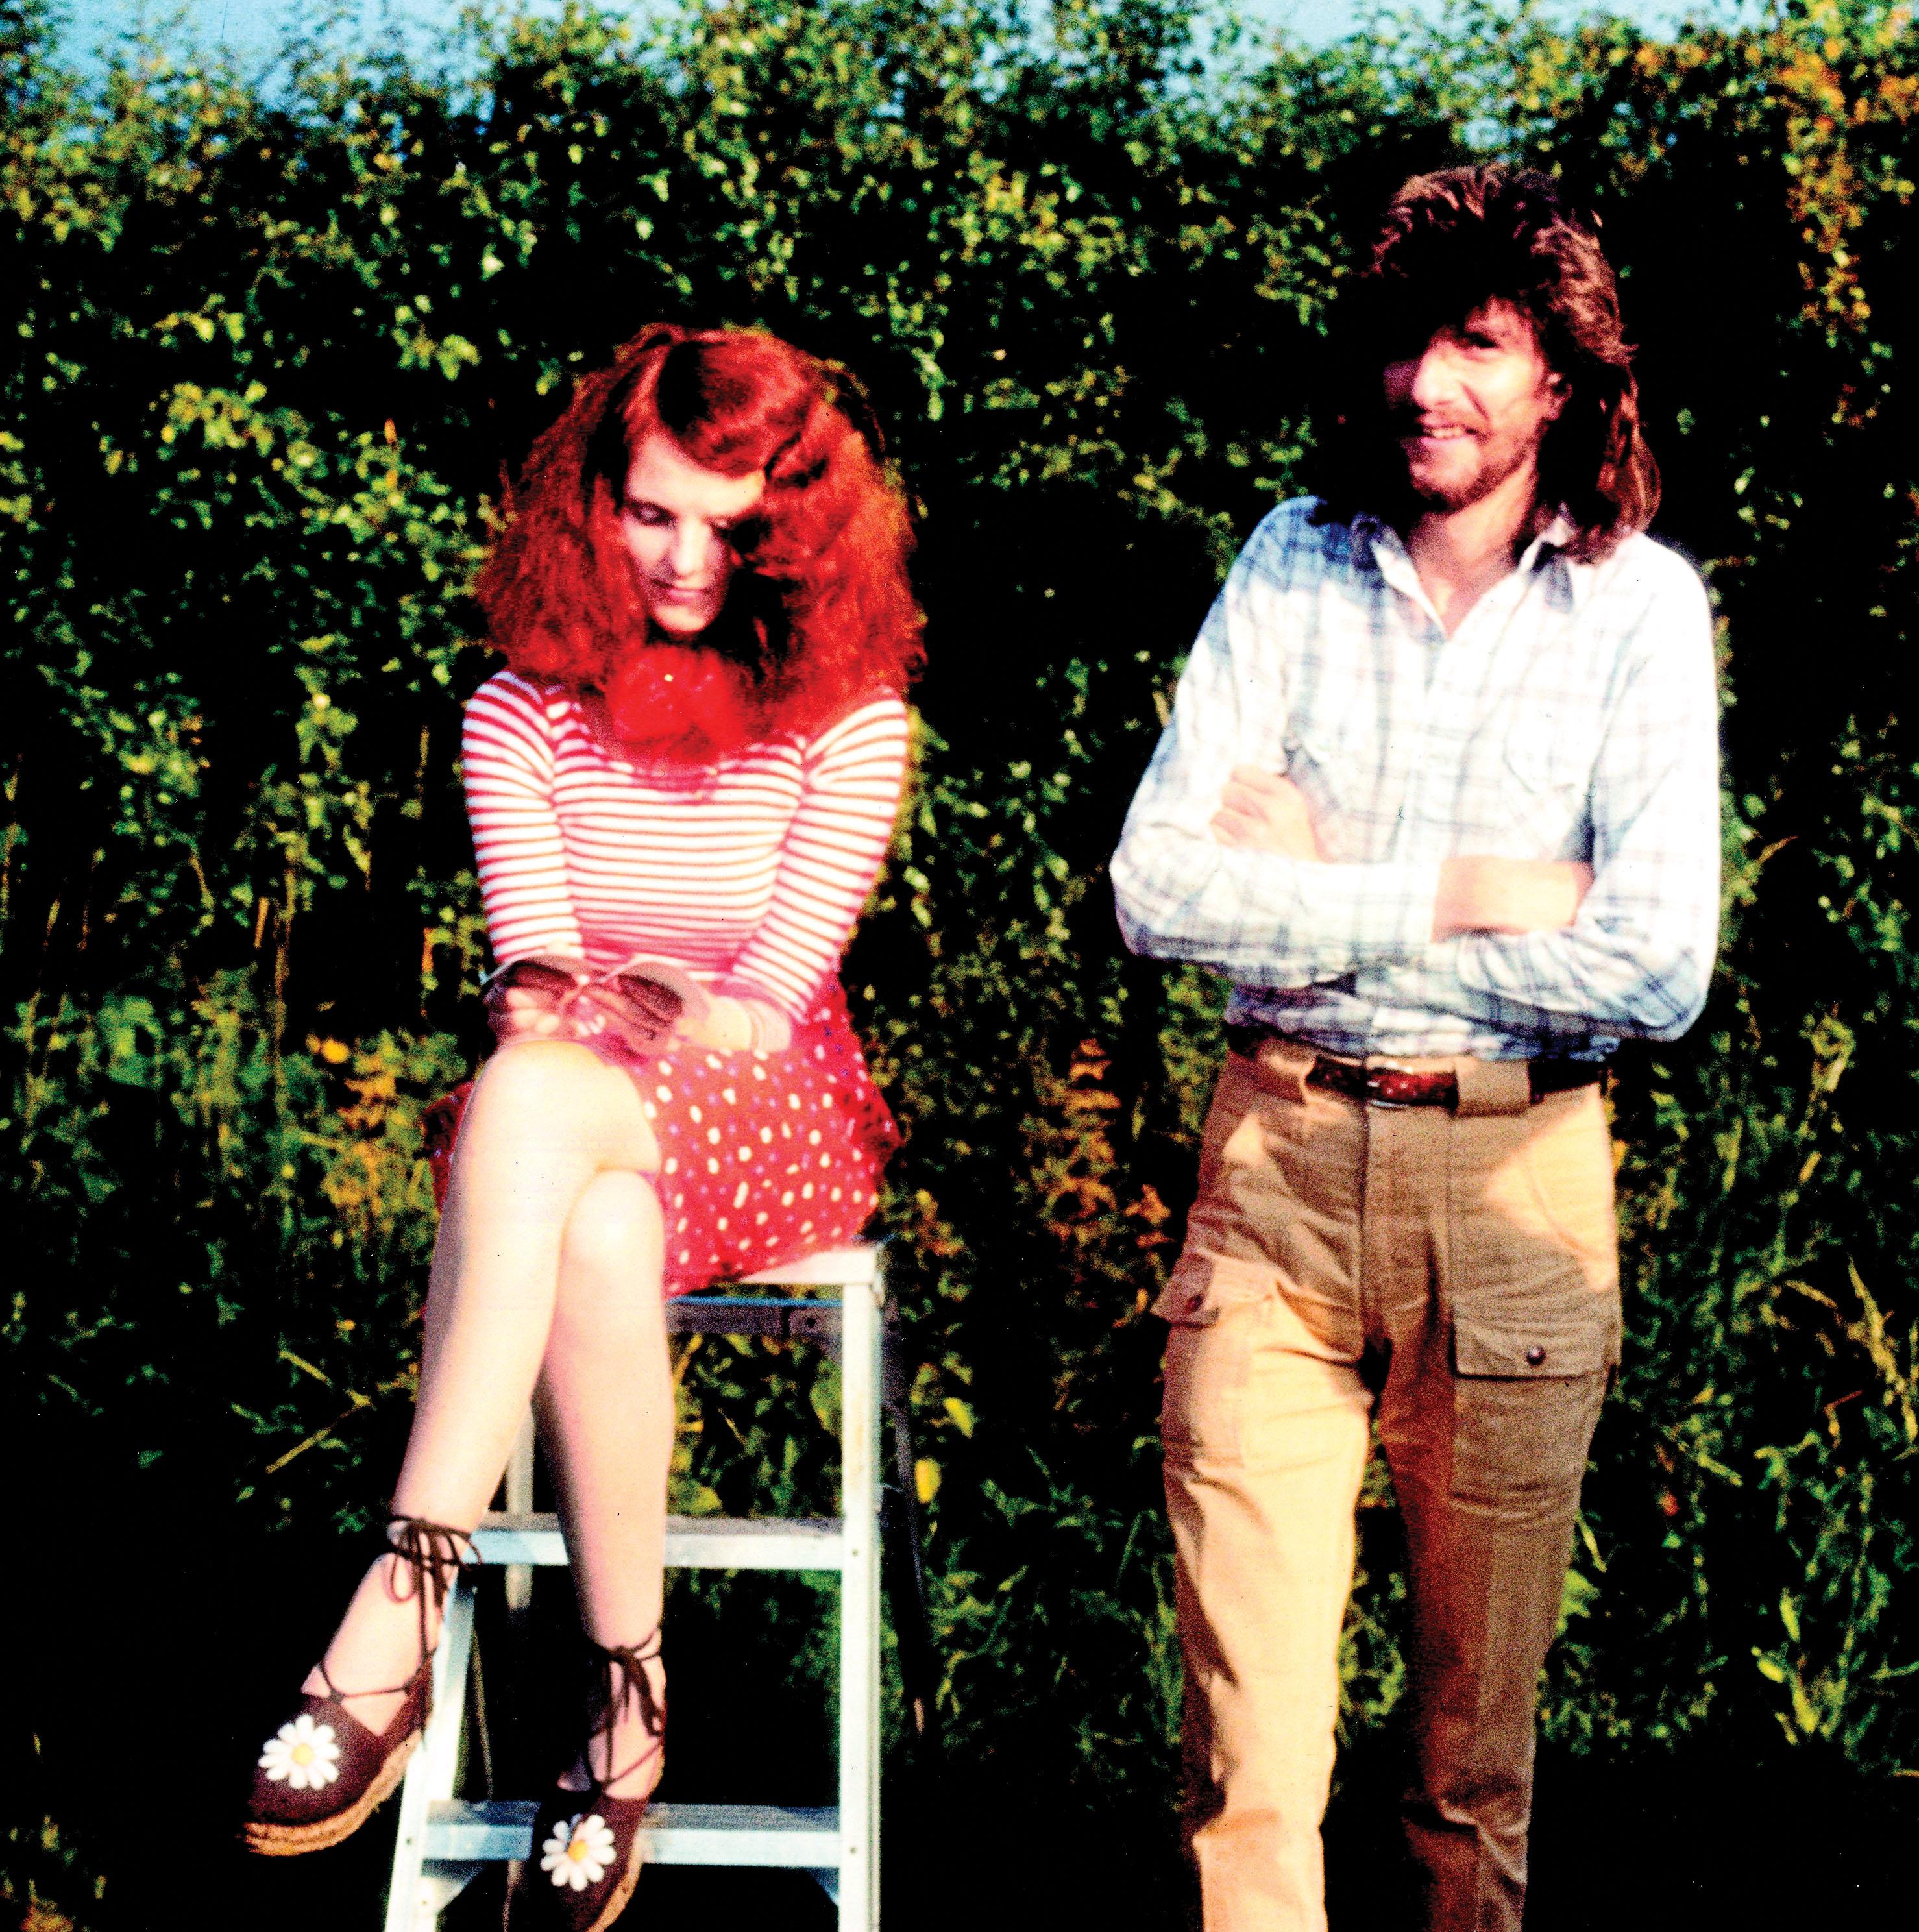 Grace Coddington and Didier Malige, Jan 12, p126